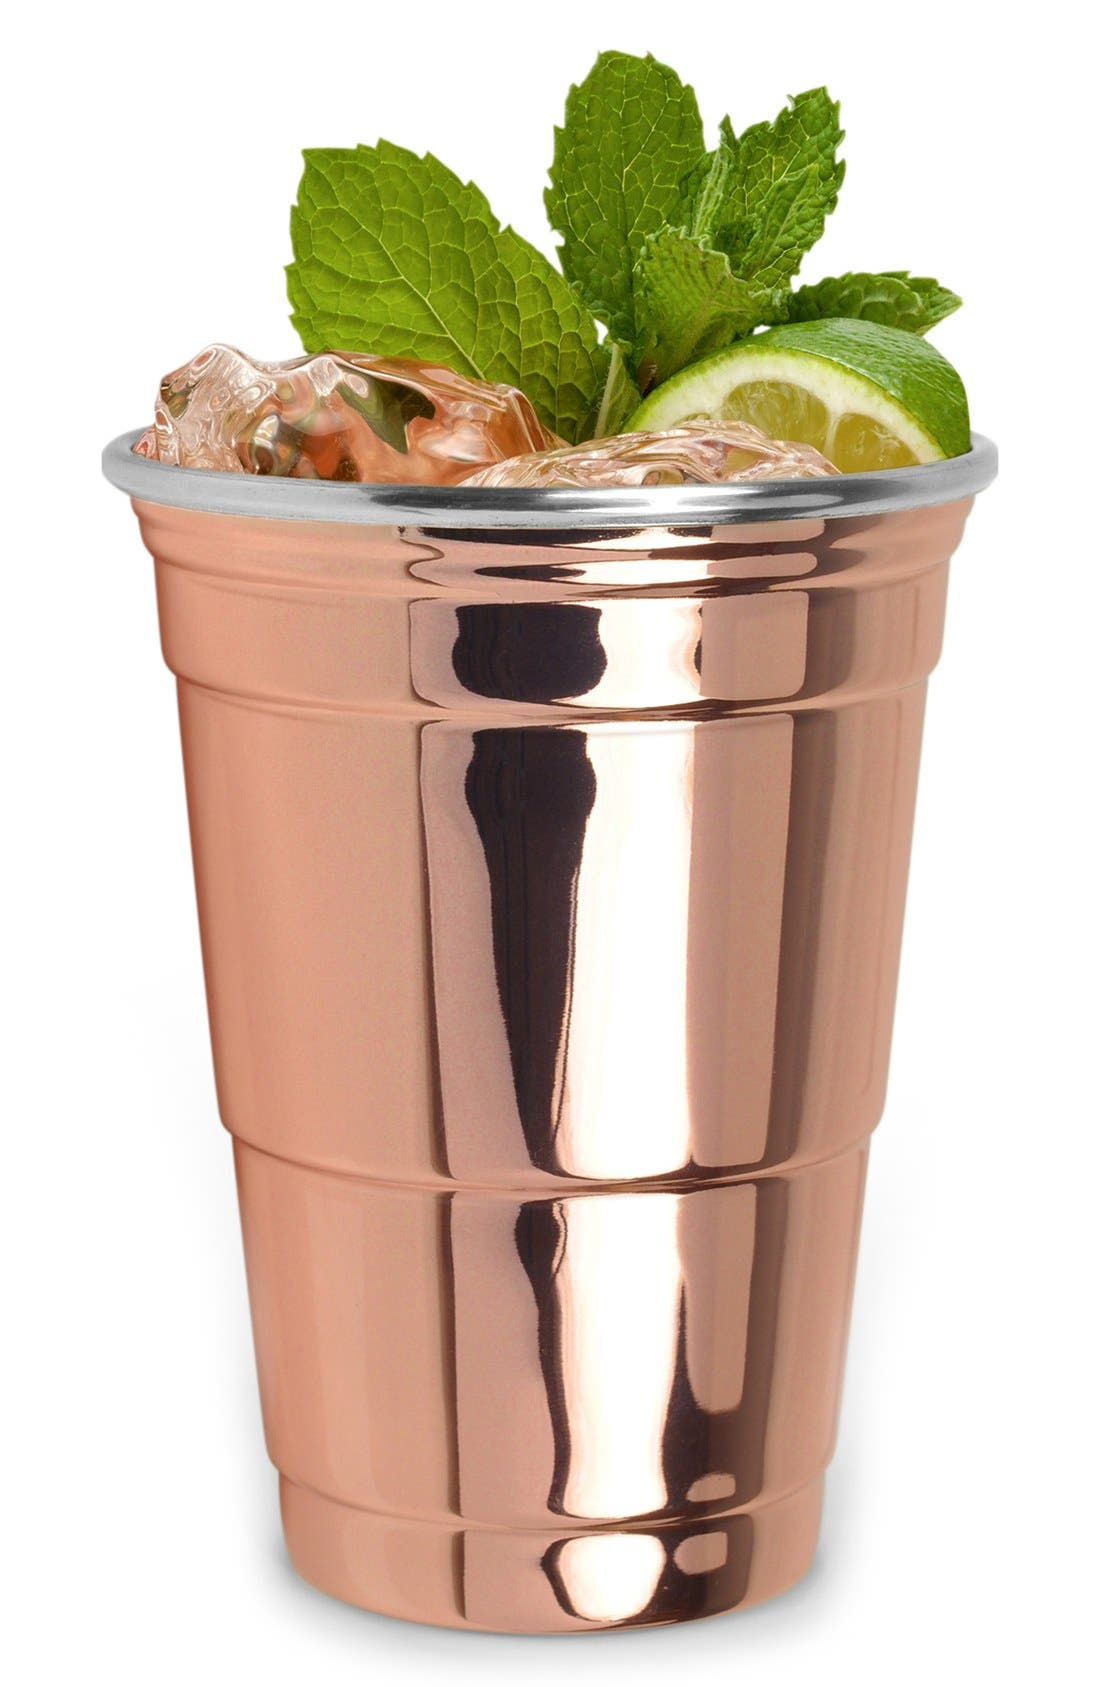 Copper Party Cup,                             Alternate thumbnail 2, color,                             Metallic Rust/ Copper